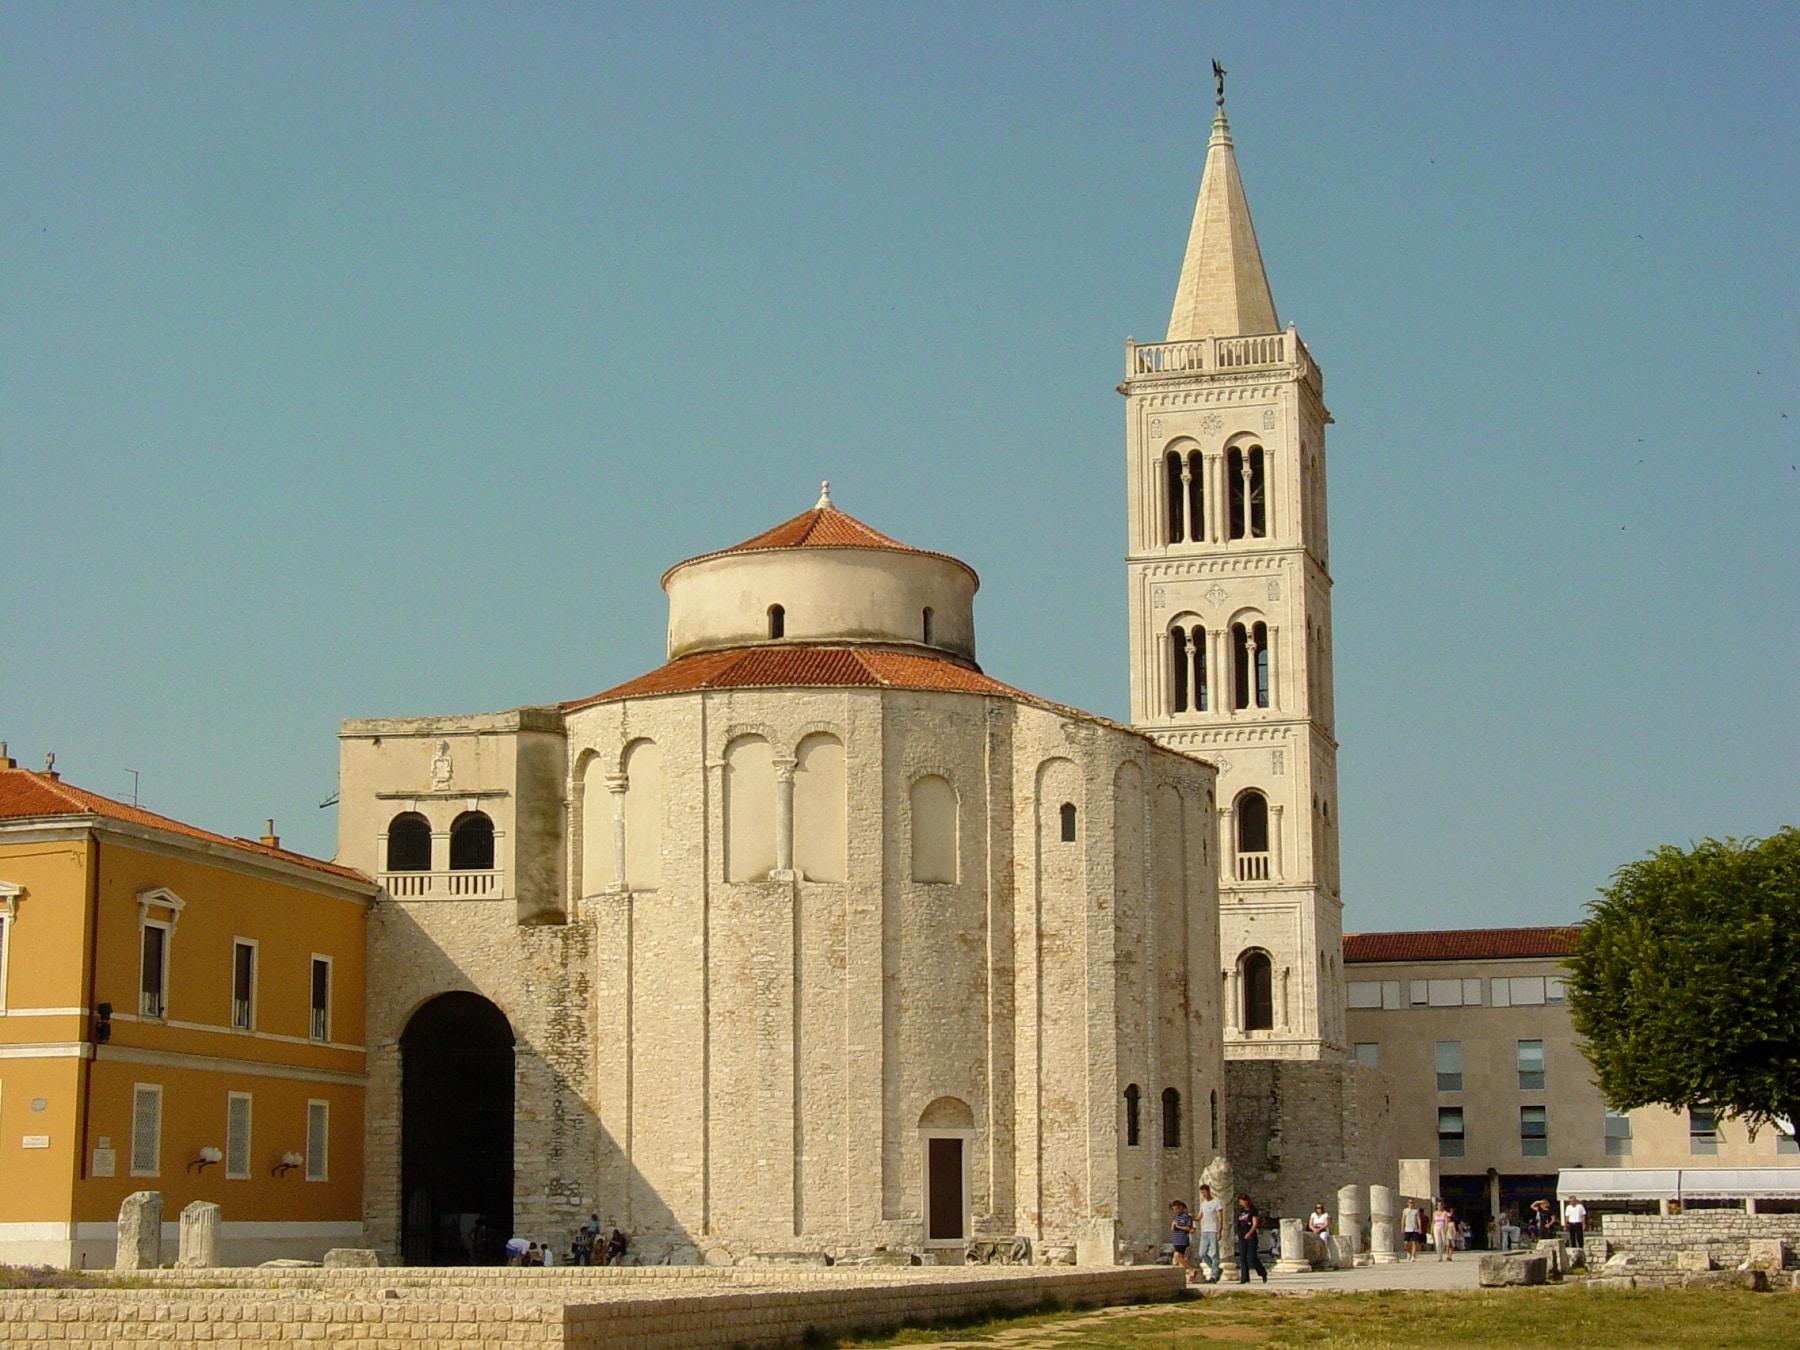 Biserica Sfântul Donat - simbolul orașului Zadar